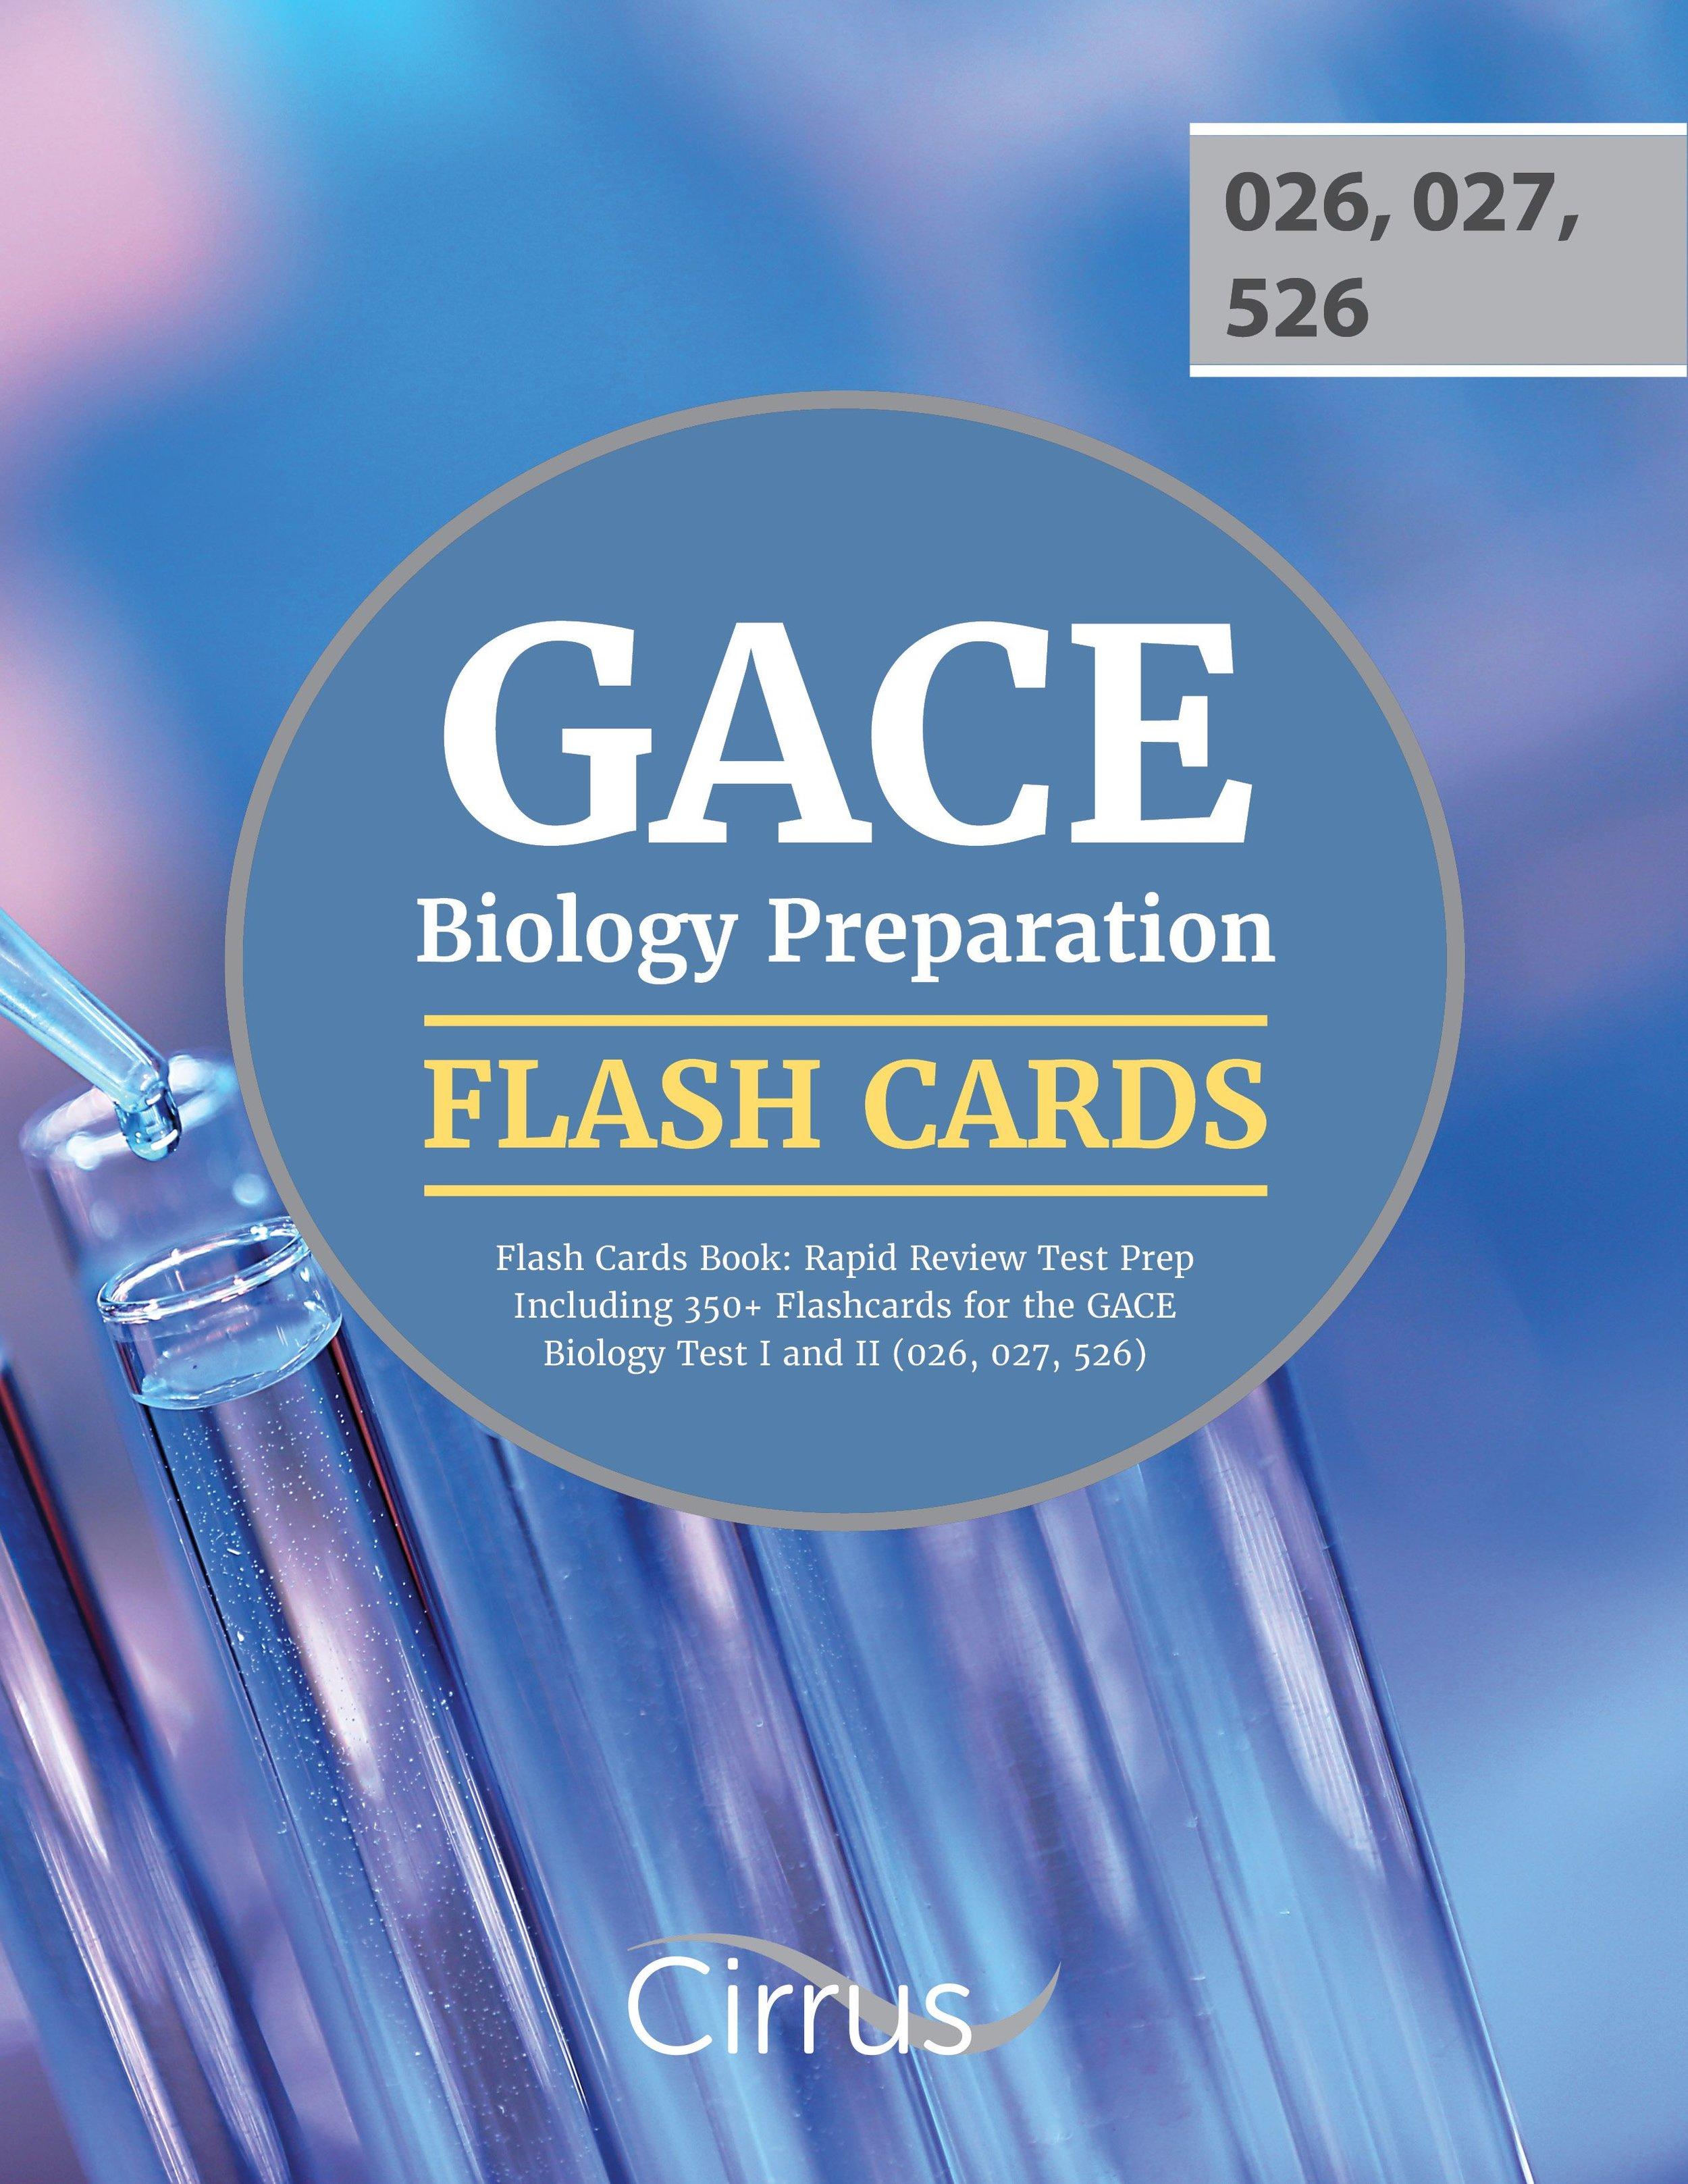 GACE Biology Preparation Flash Cards Book Rapid Review Test Prep 026, 027, 526